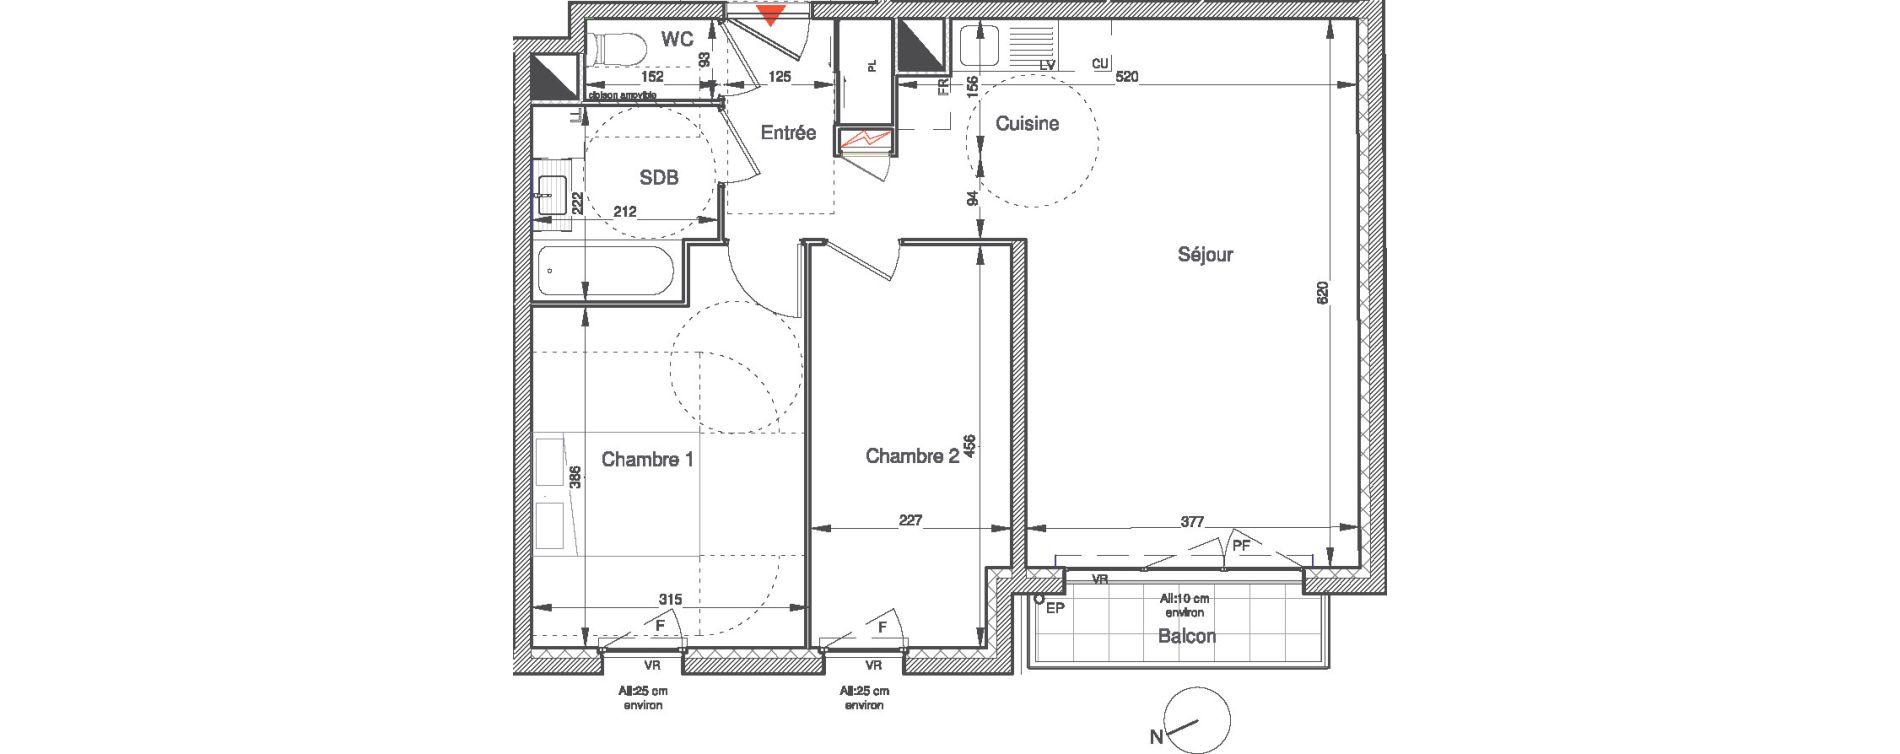 Appartement T3 de 59,99 m2 à Villepinte Vert galant